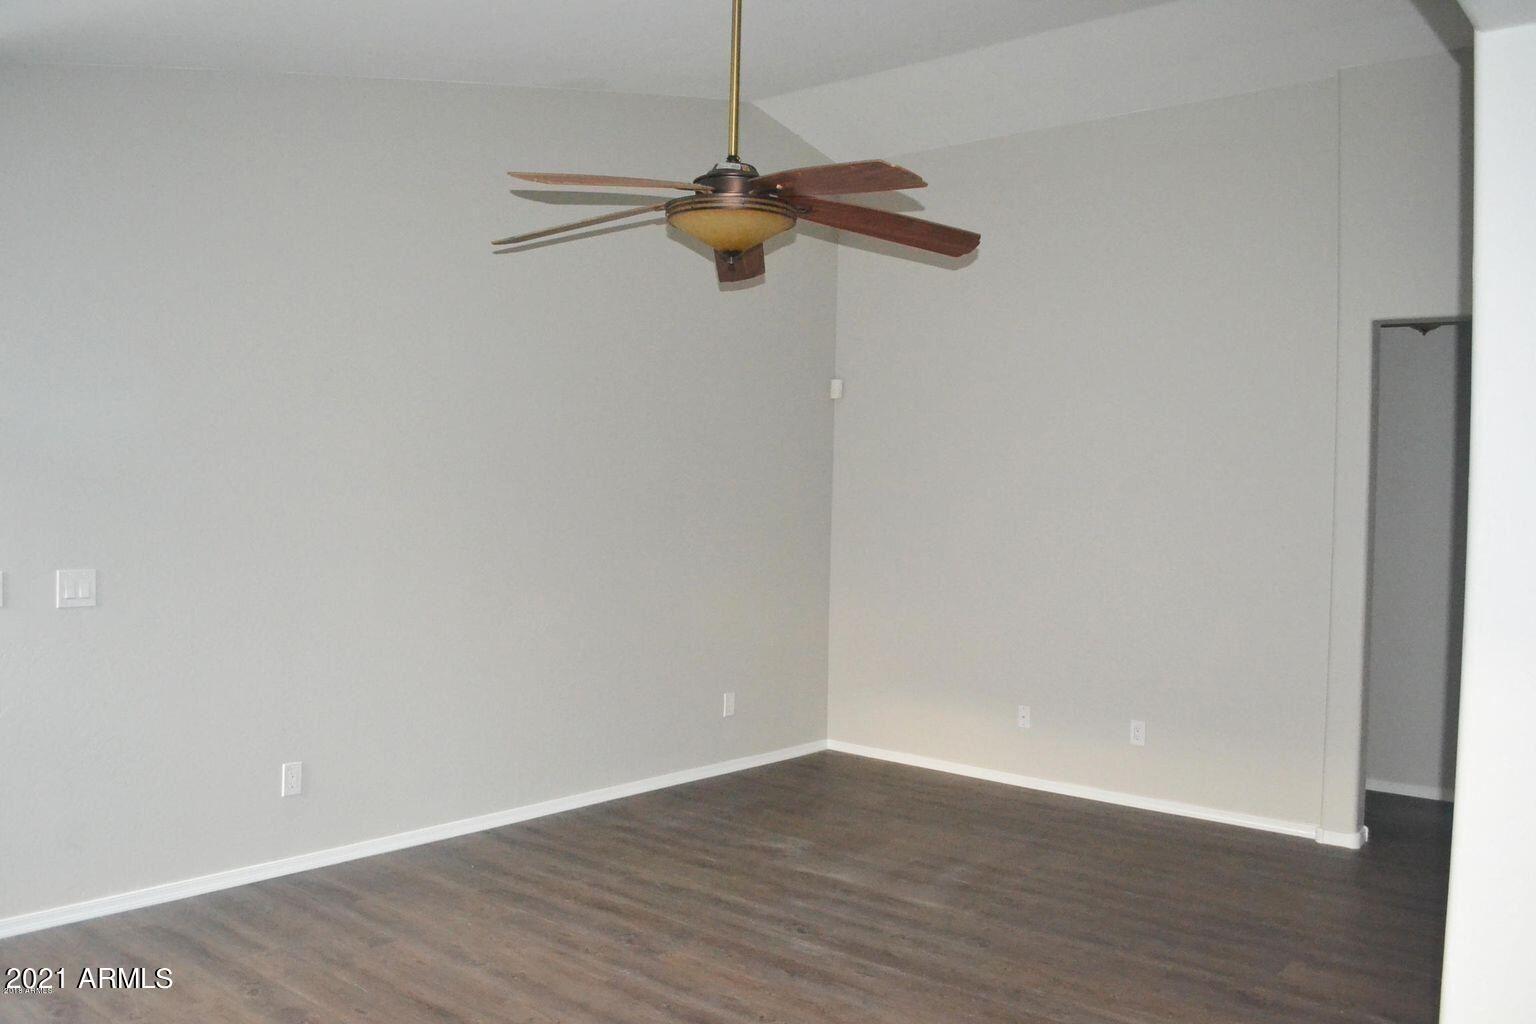 Photo of 12726 W SCOTTS Drive, El Mirage, AZ 85335 (MLS # 6296756)